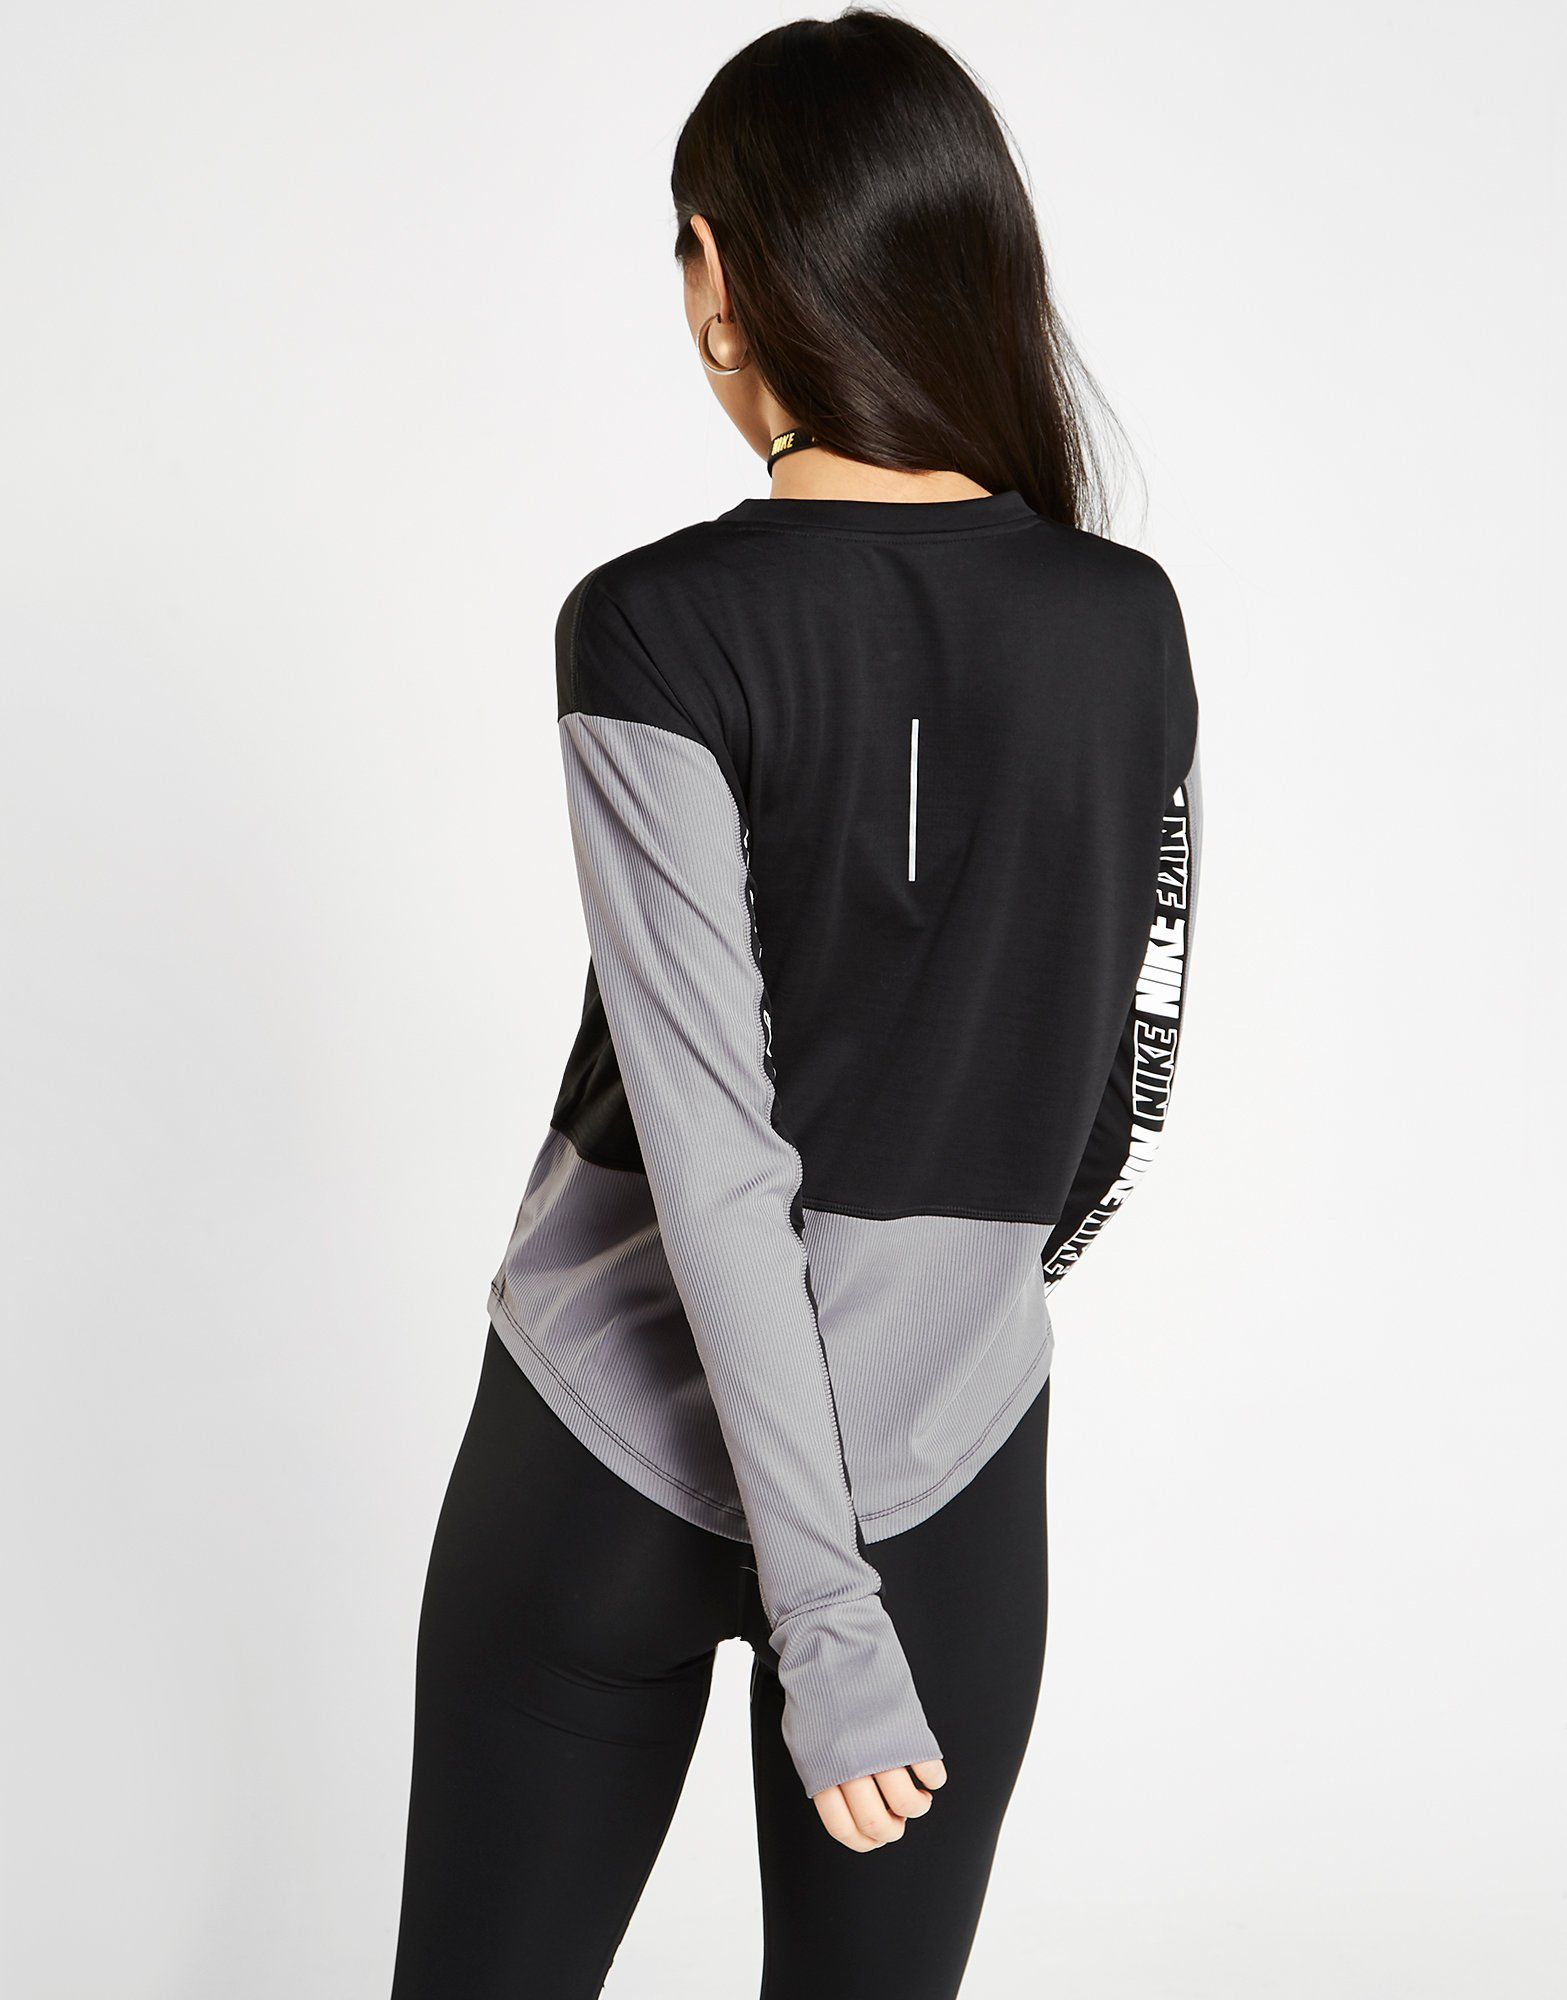 Nike Running Pacer Crew Top